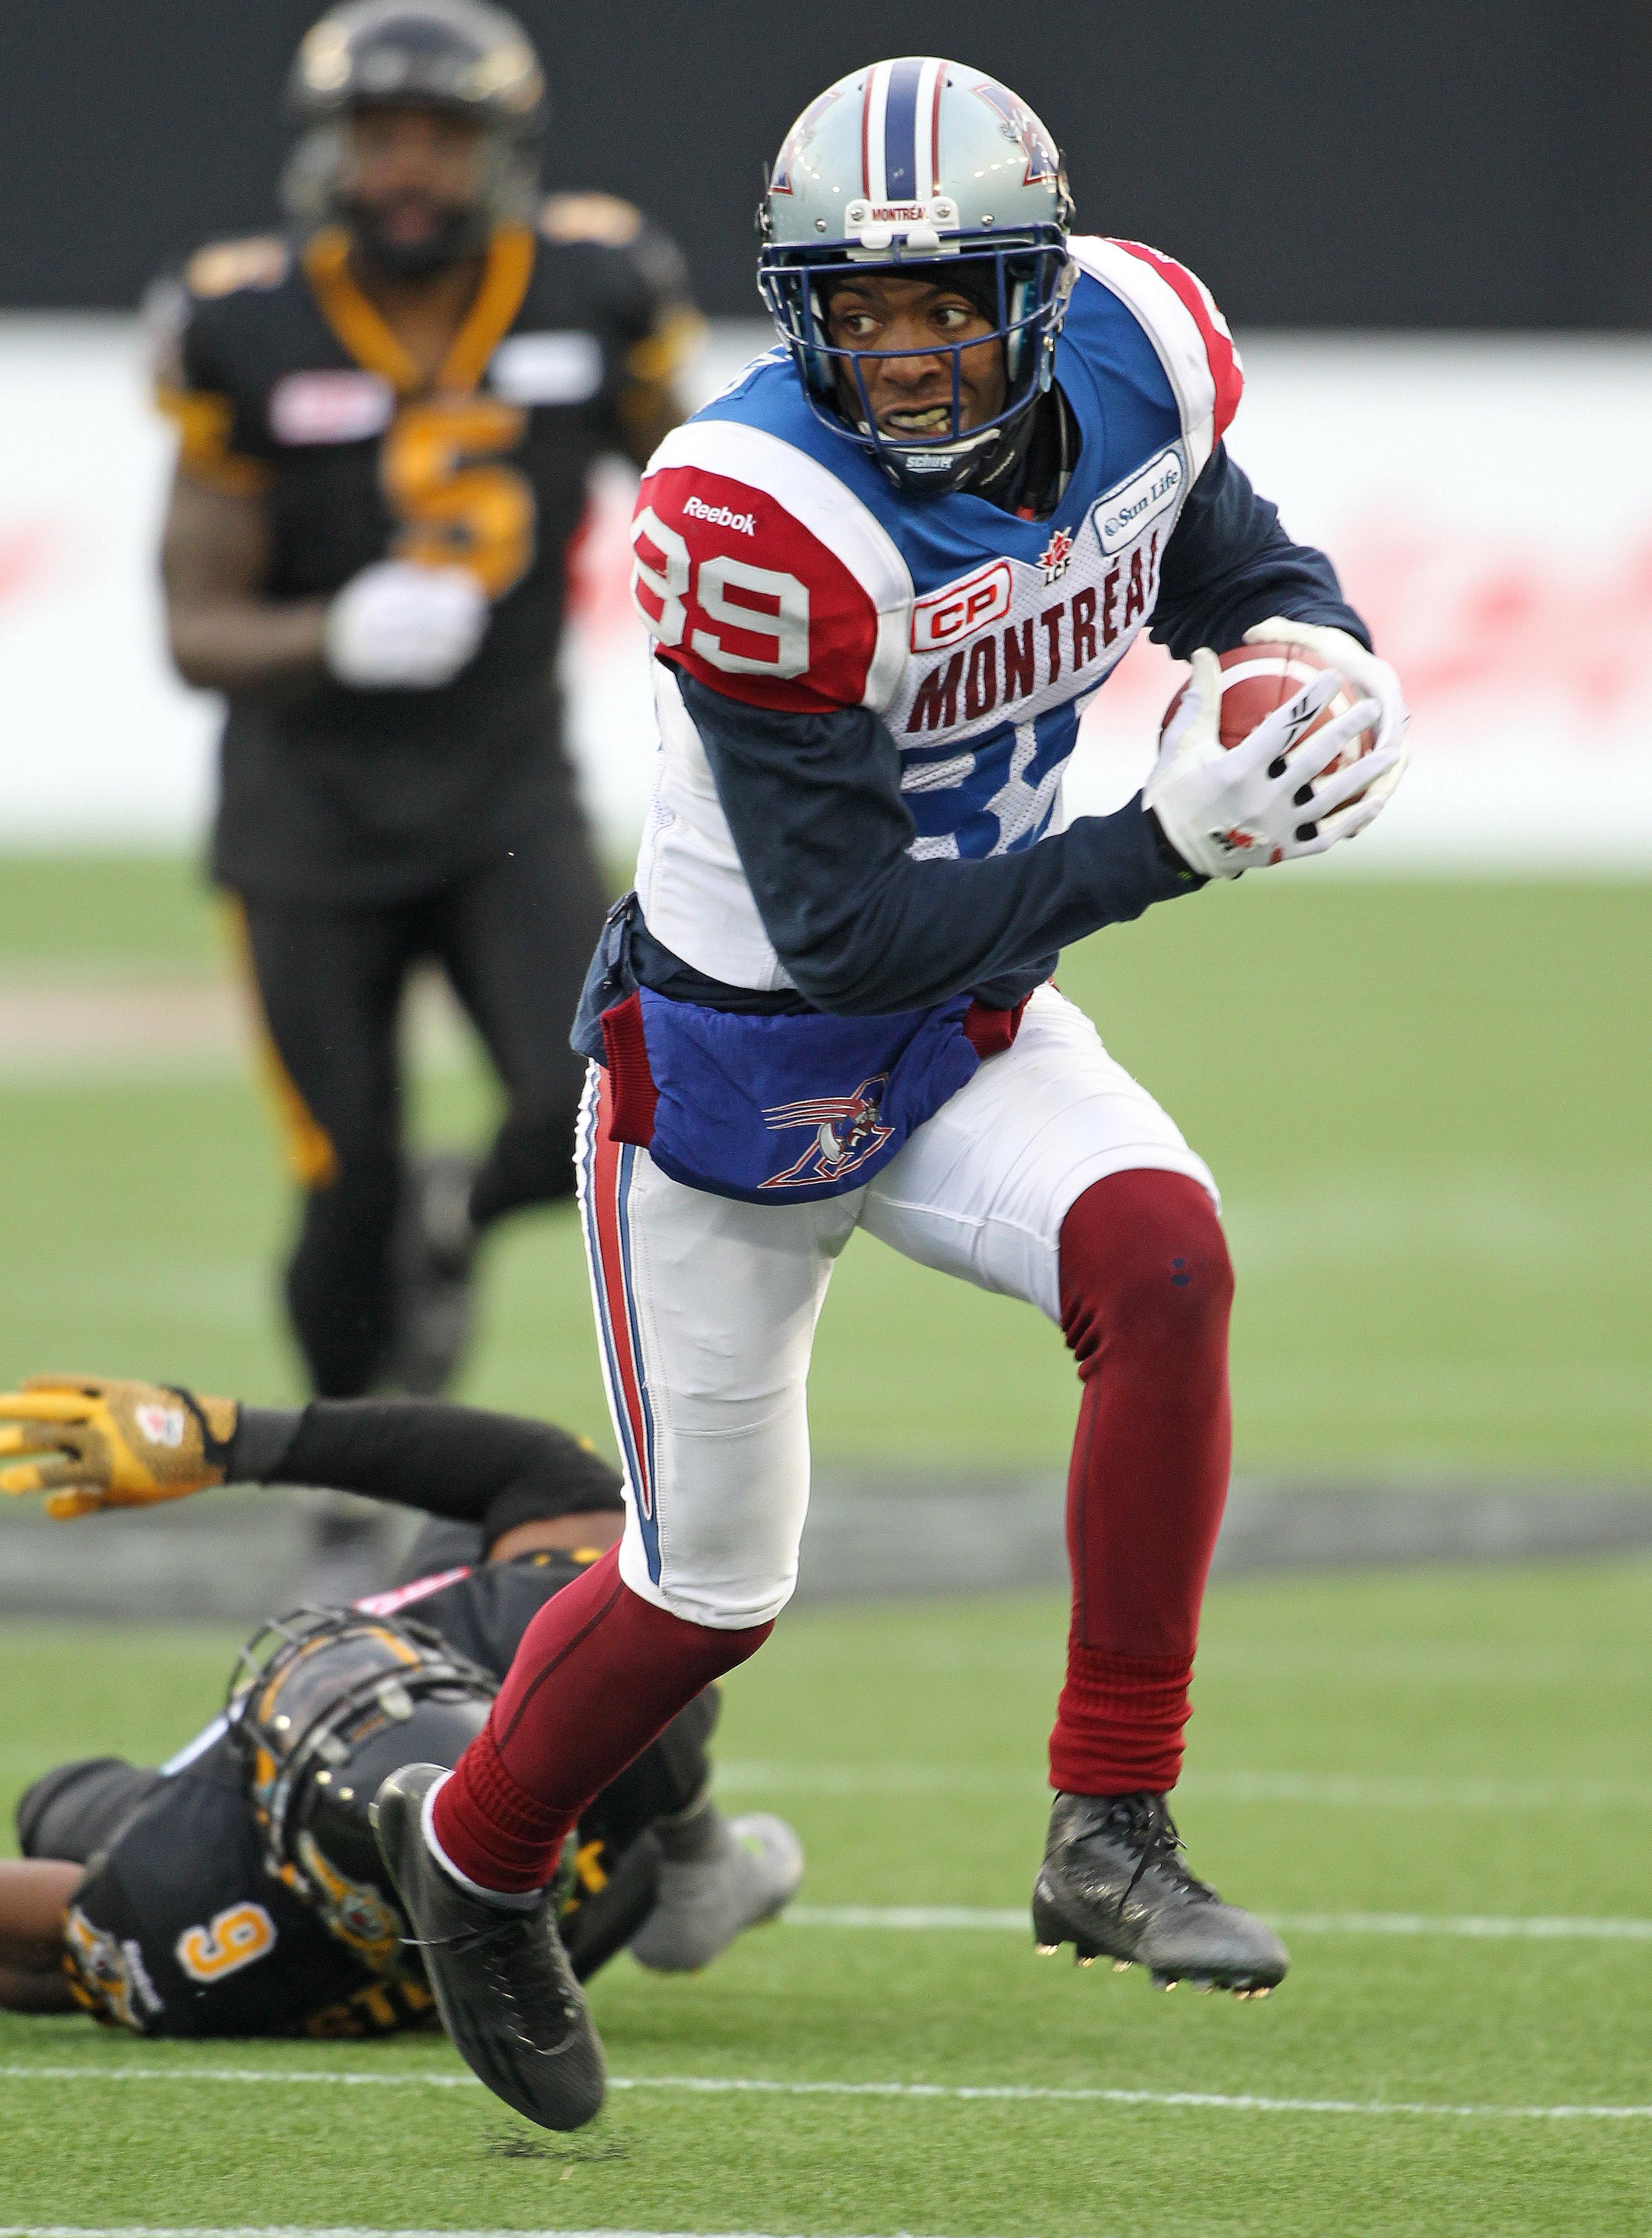 Division Finals - Montreal Alouettes v Hamilton Tiger-Cats